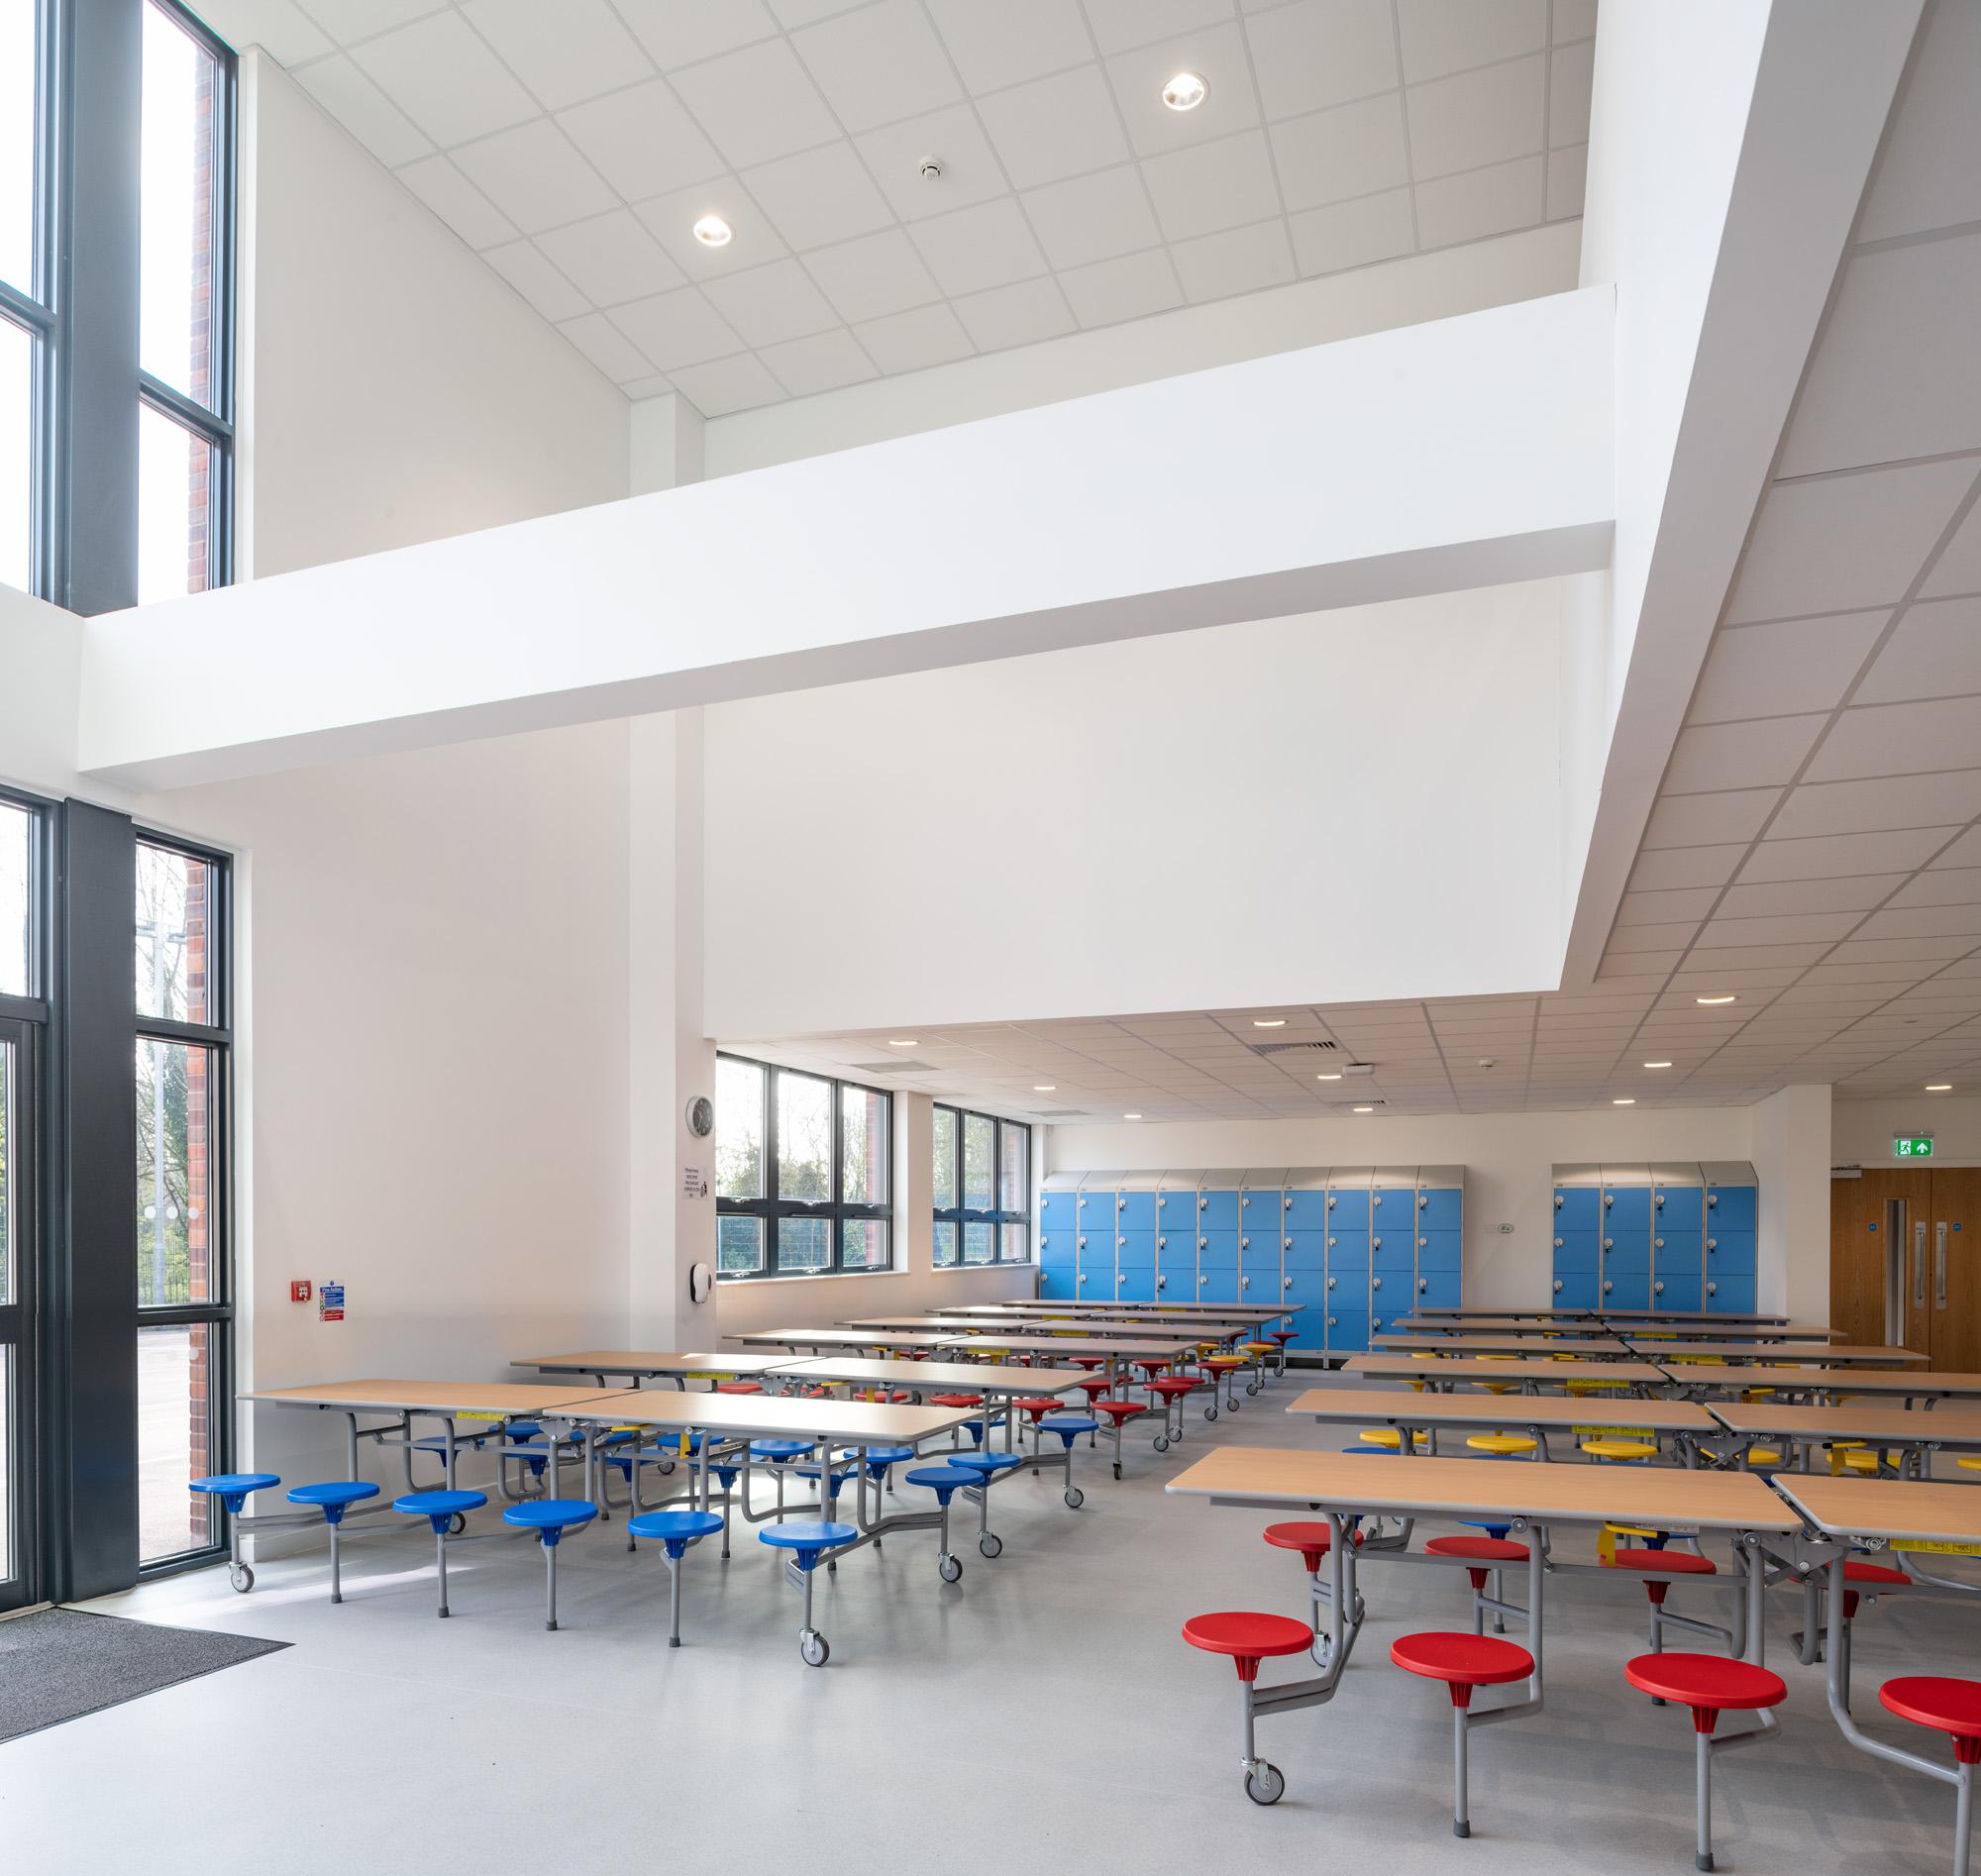 The Belvedere Academy